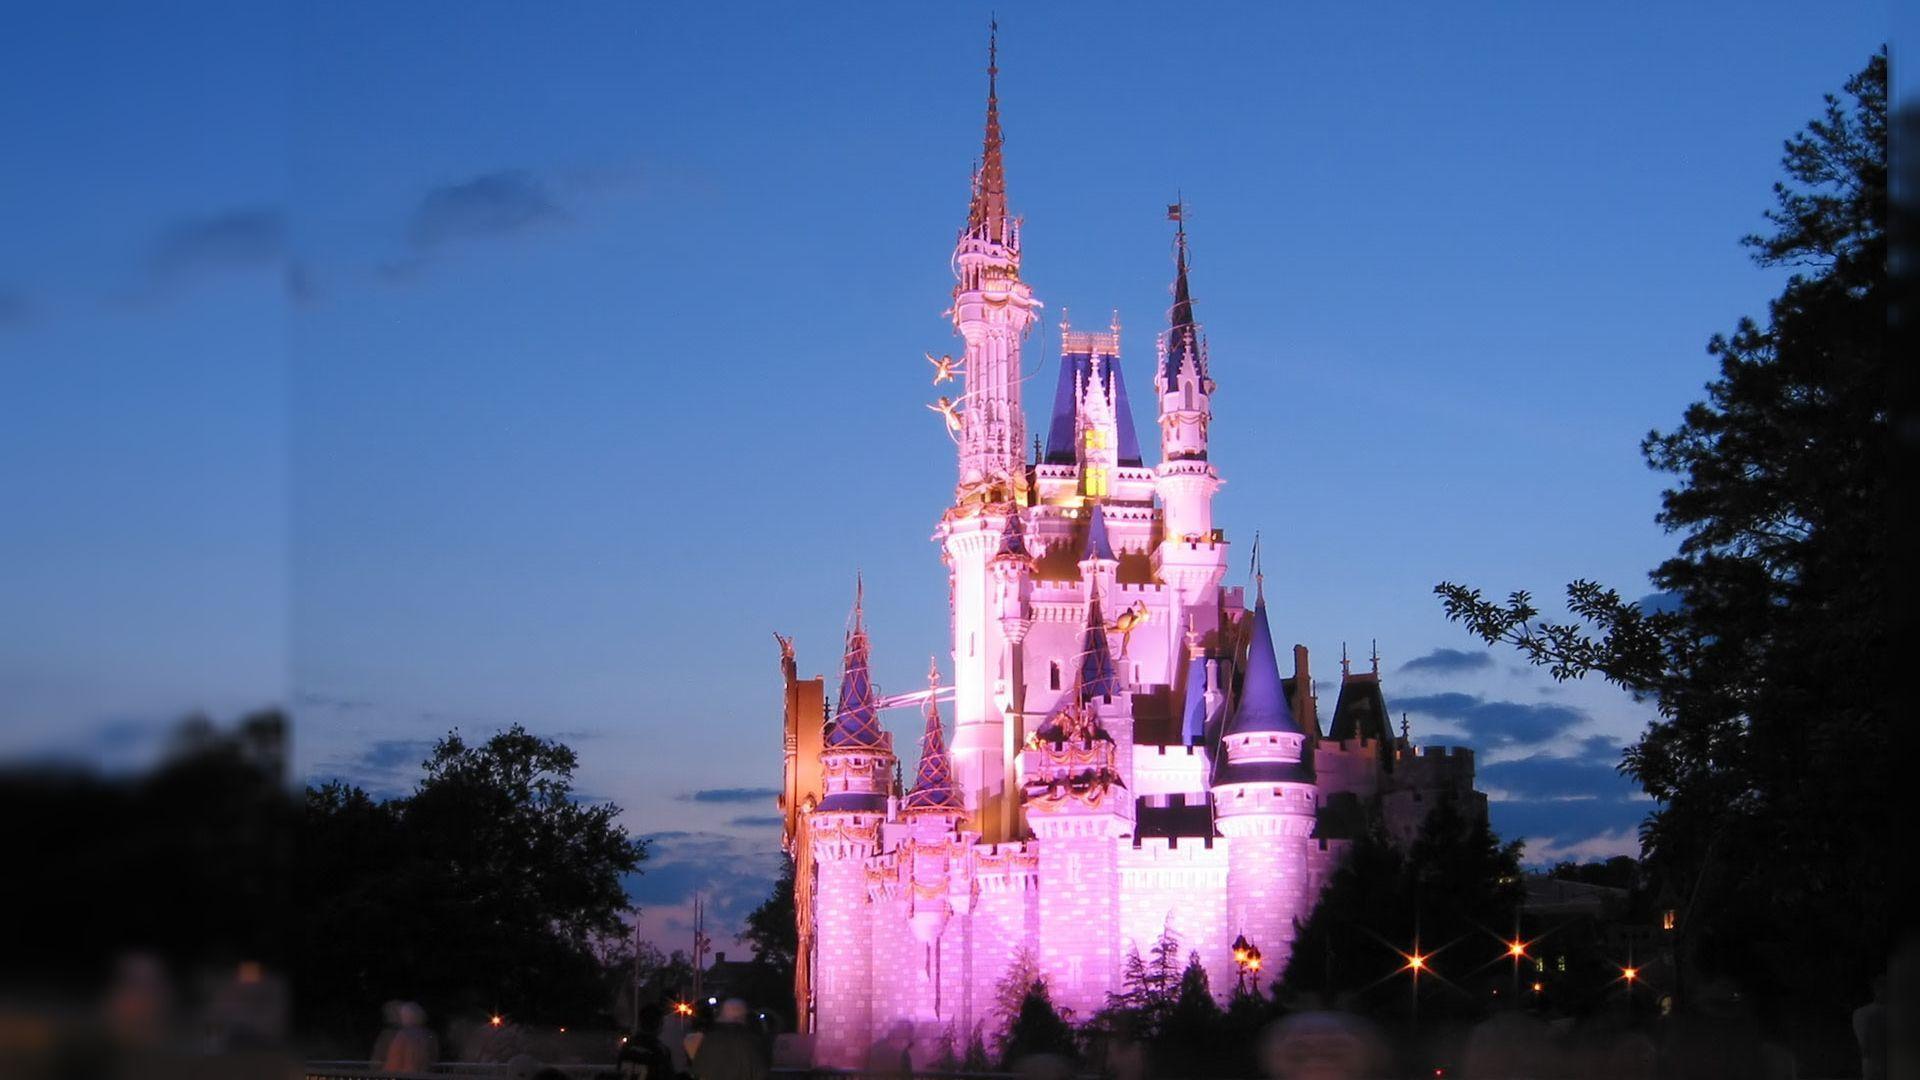 Disney World Castle 1920x1080 Wallpaper Teahub Io